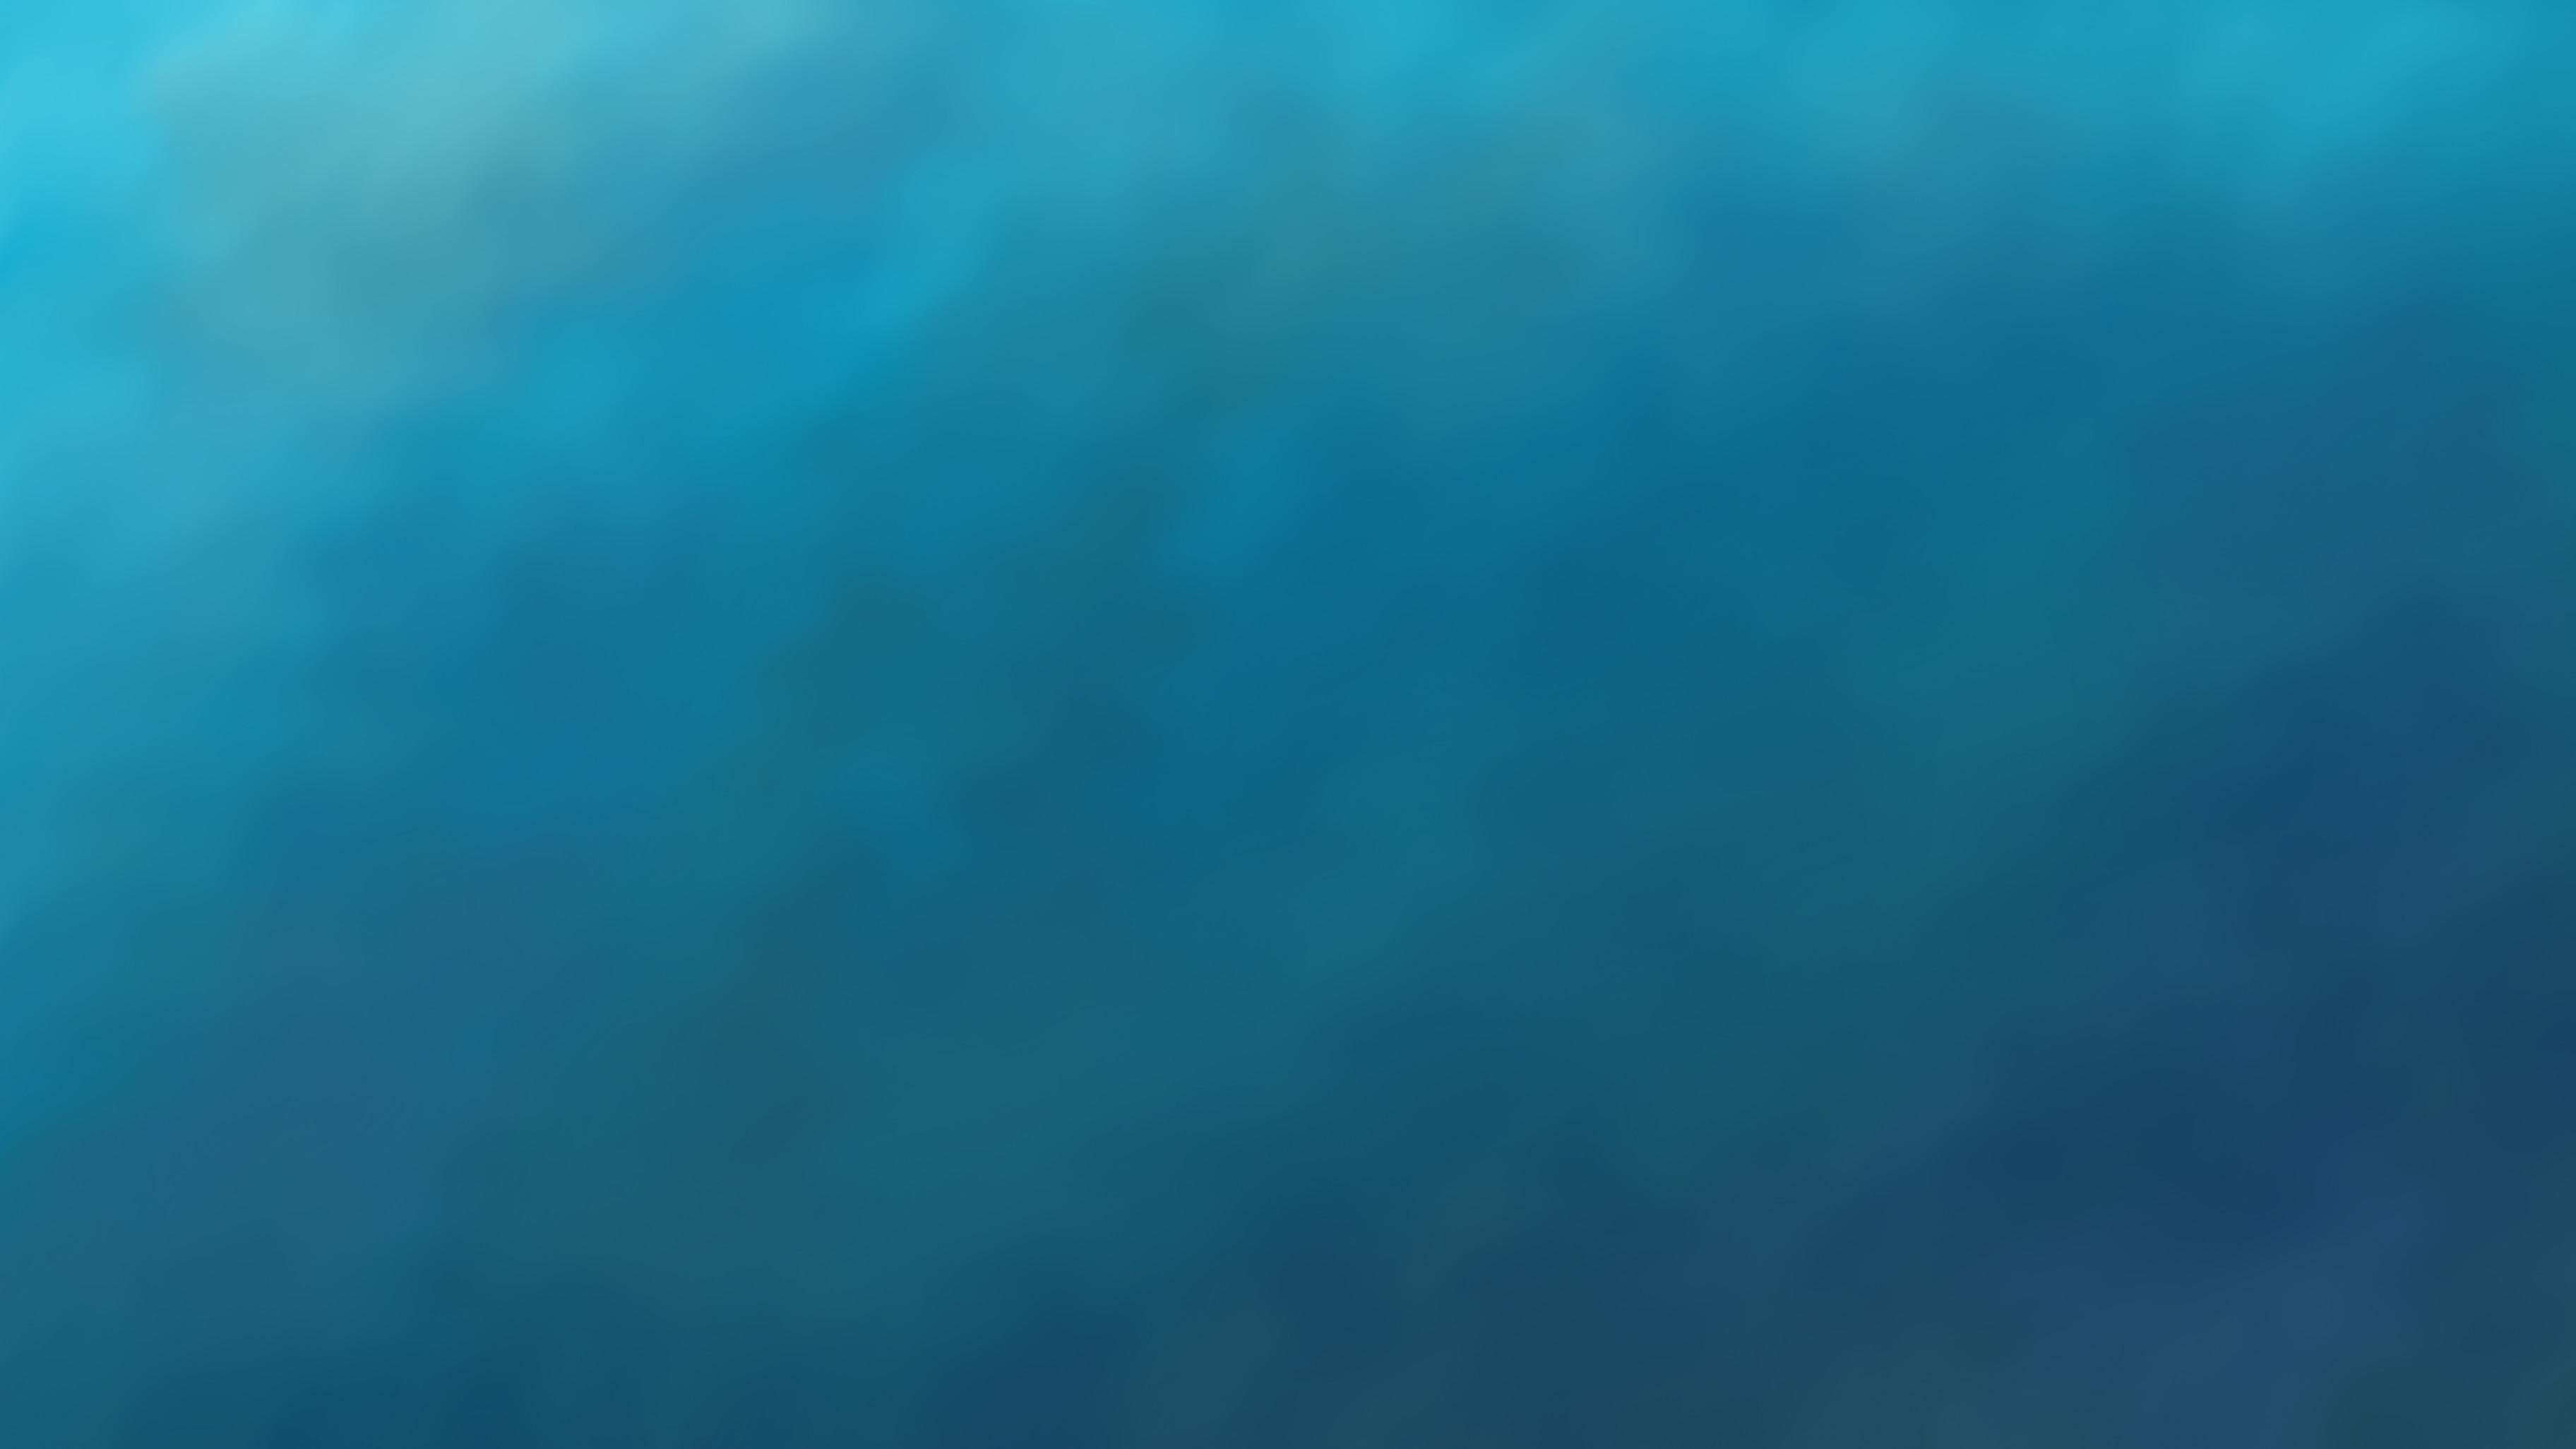 Fedora 25 wallpaper – Soft Blue